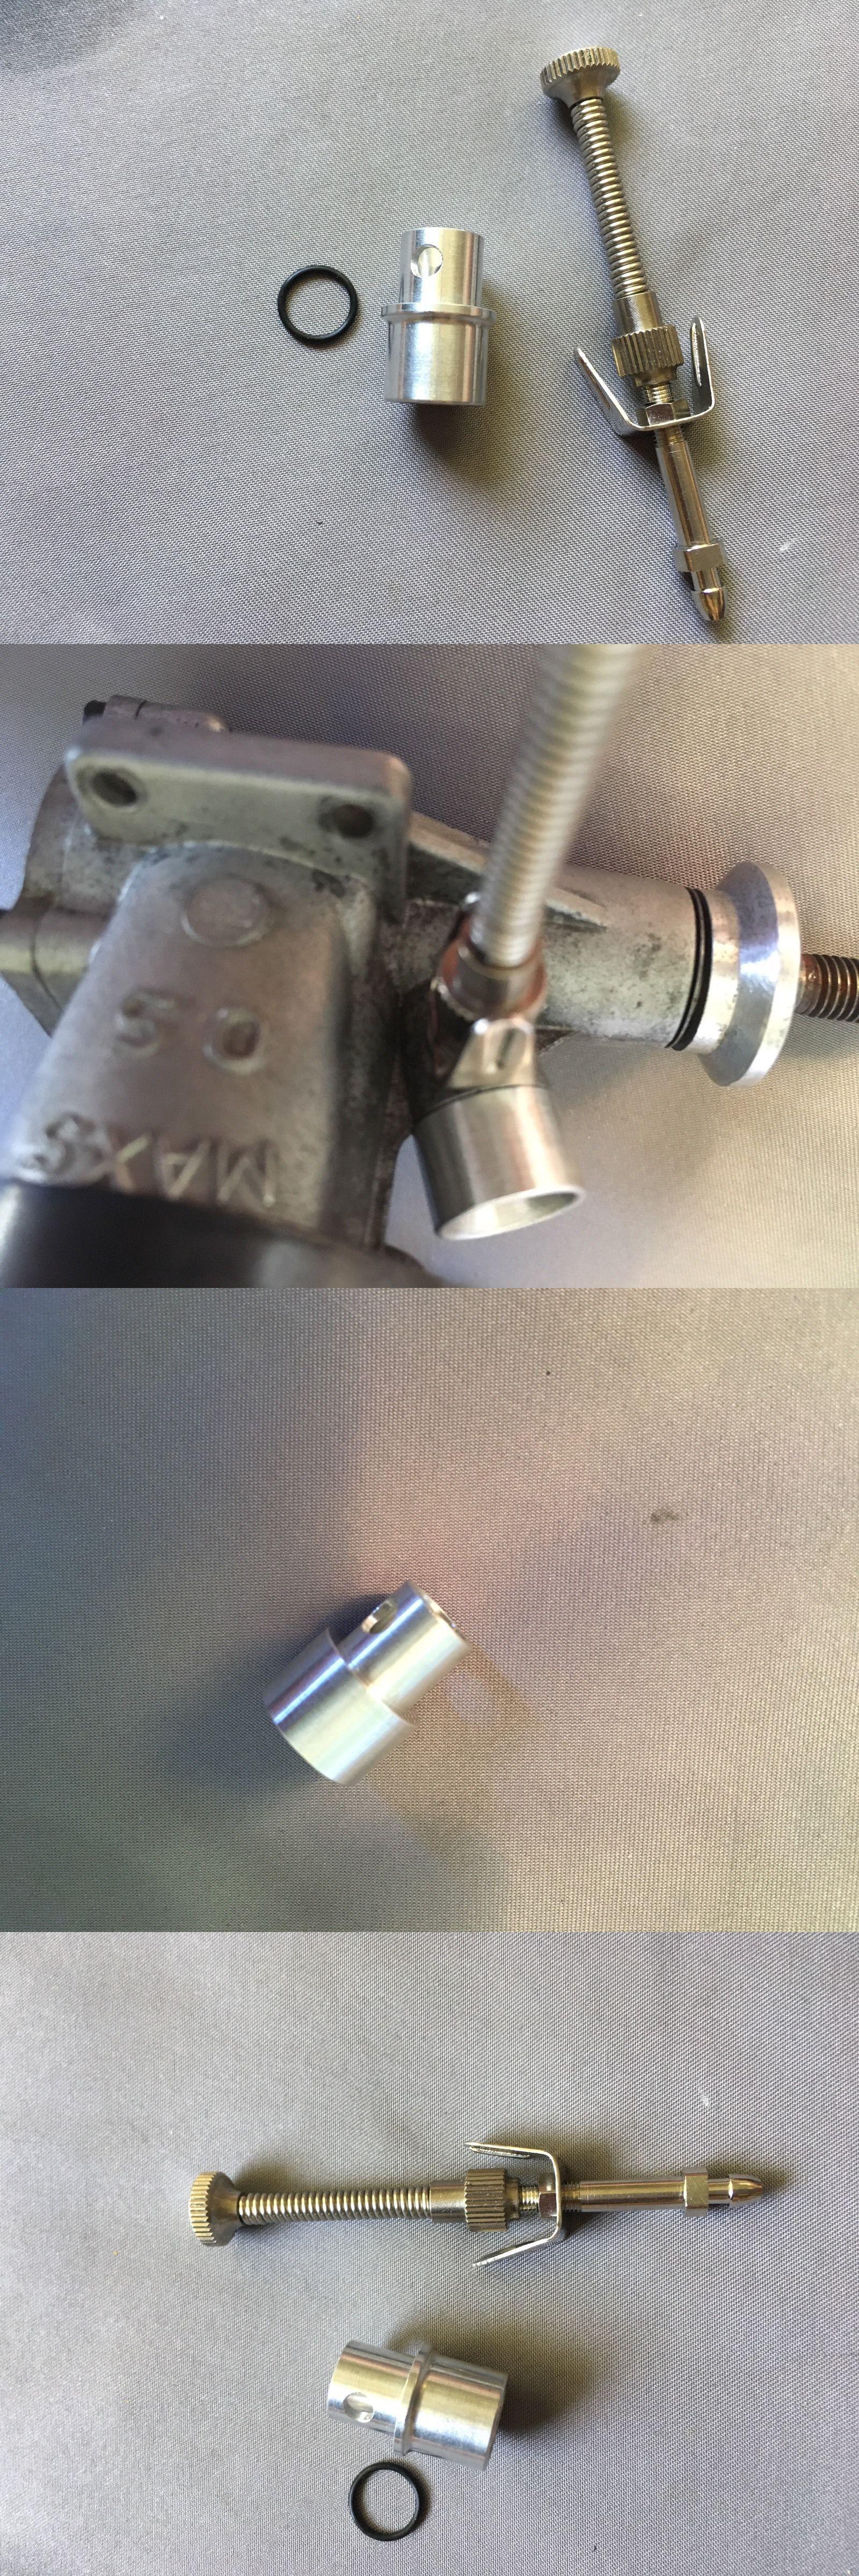 OS  MAX S 30-35 C//L VENTURI NIP WITH O RING SEE DESCRIPTION